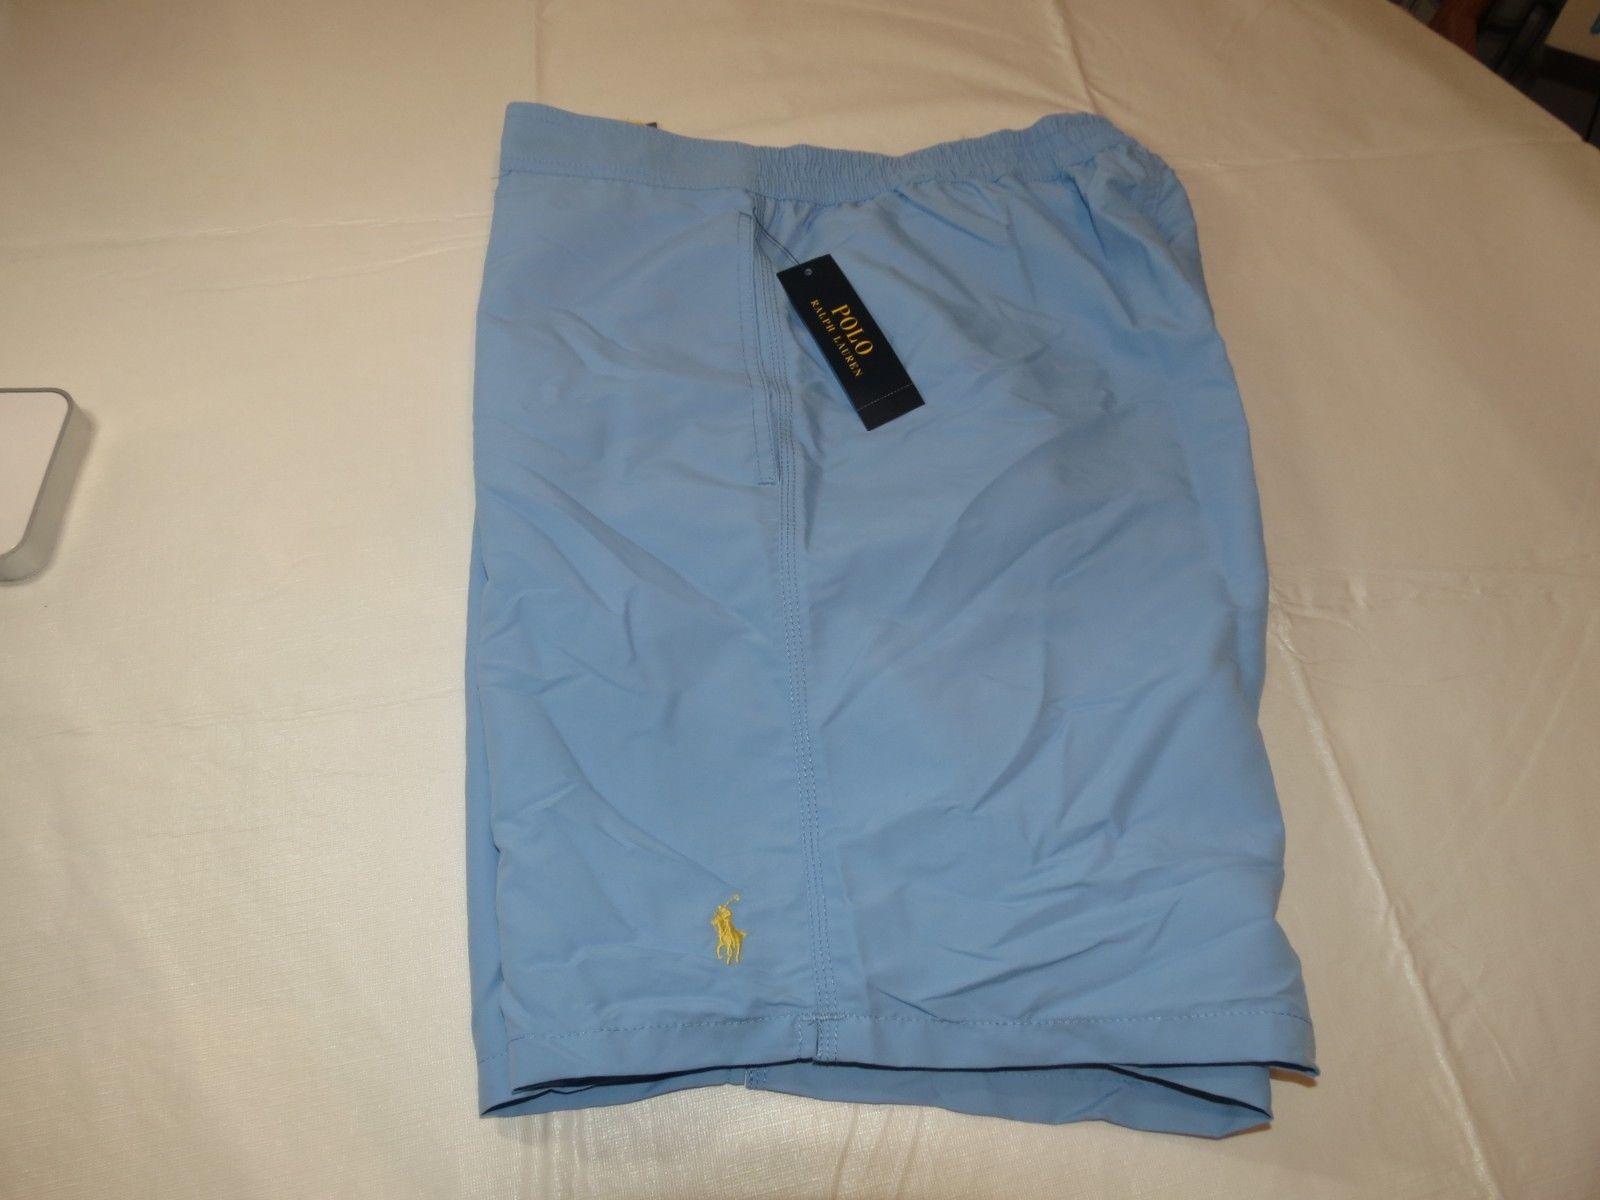 Mens Polo Ralph Lauren Board Shorts Swim shorts XL 710587928019 Lt Blue NWT